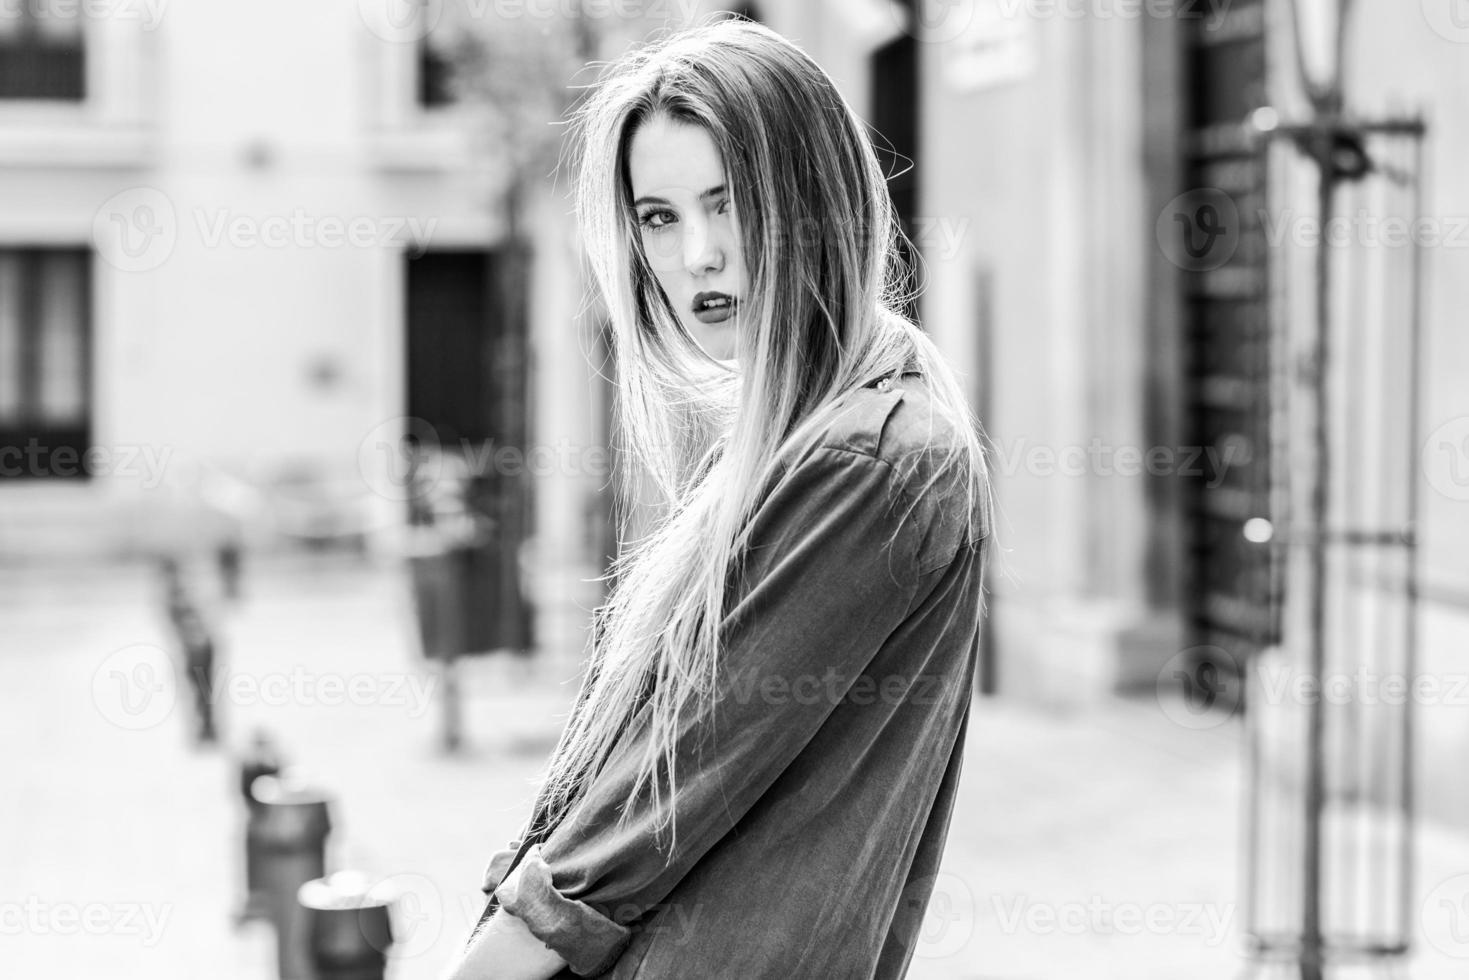 ragazza bionda sfondo urbano foto